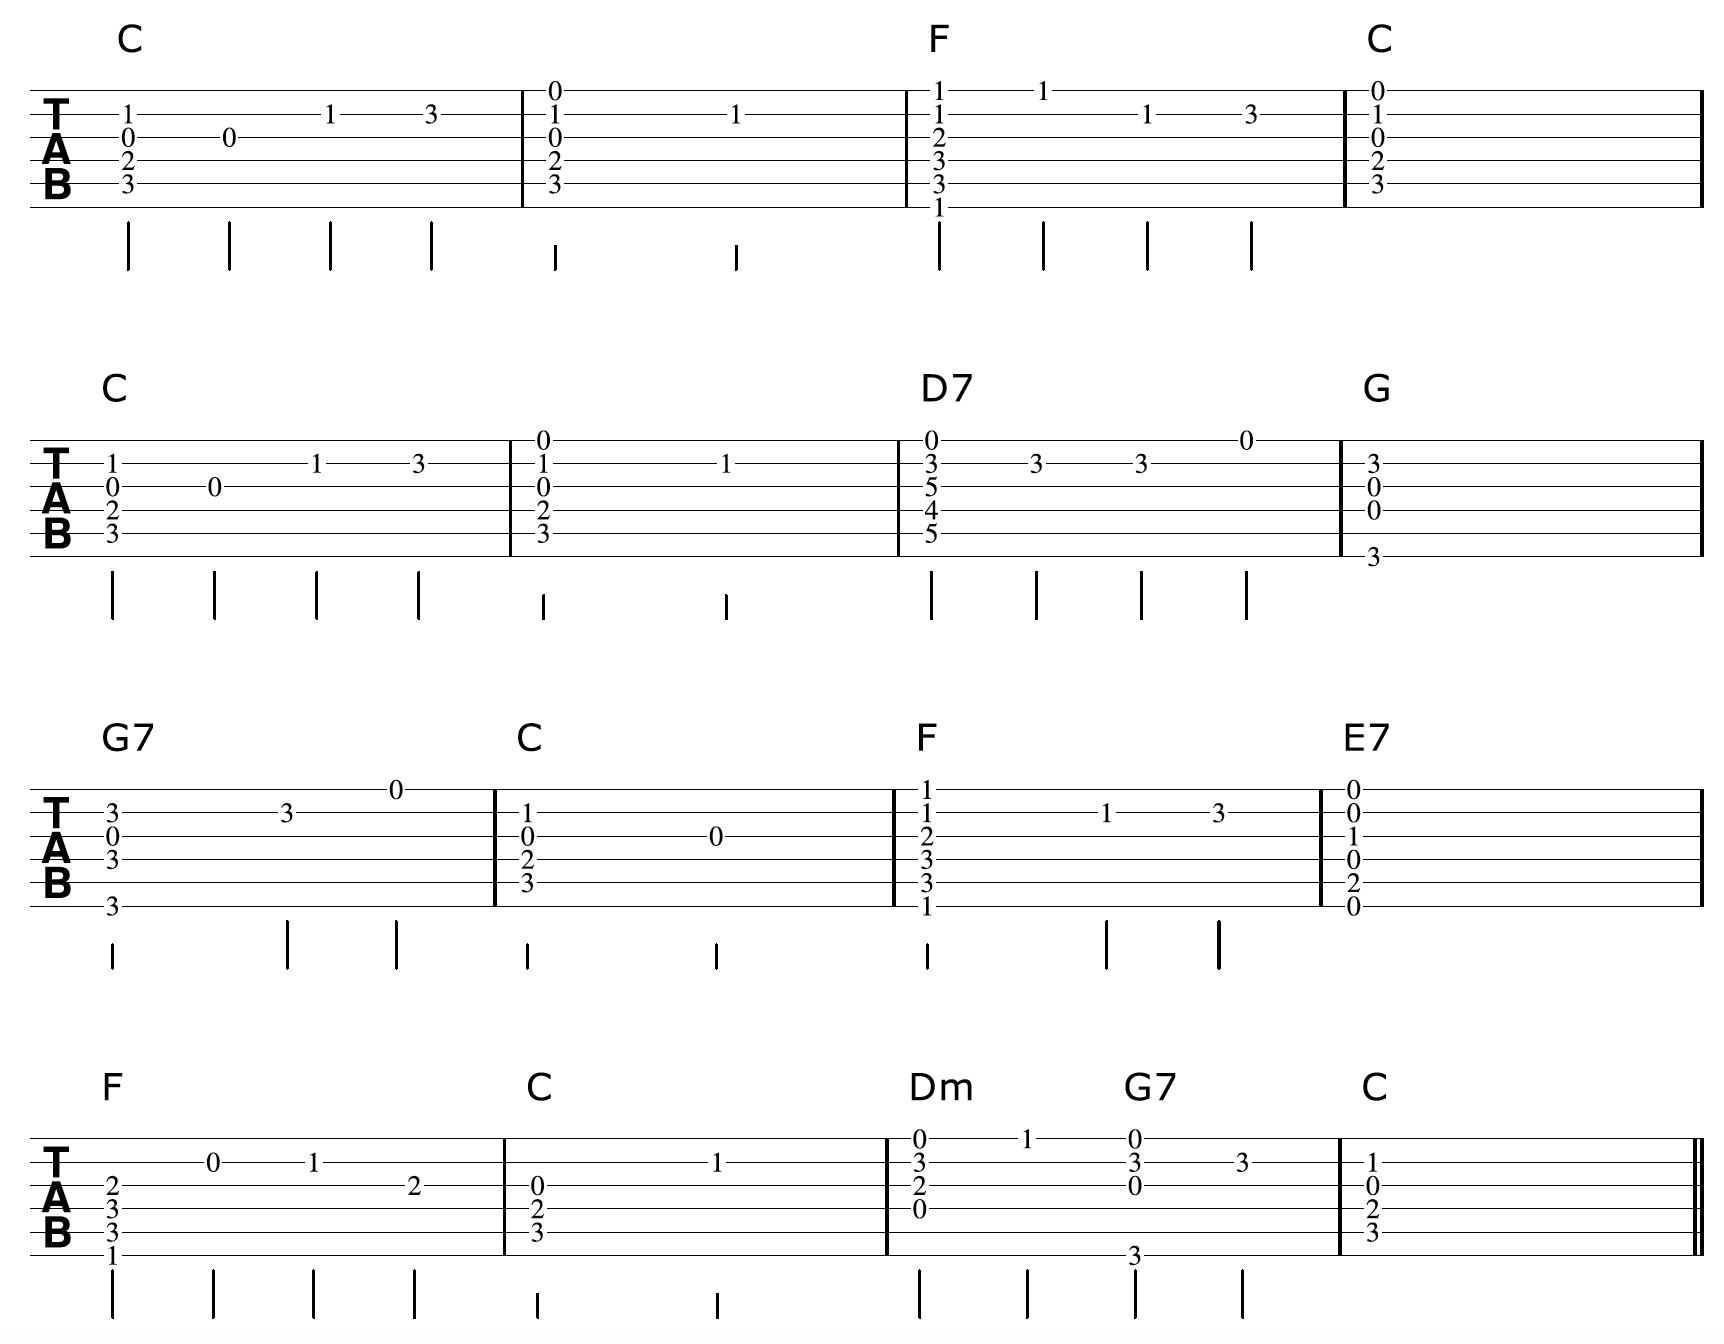 Fingerpicking Guitar Arrangement Chords And Melody